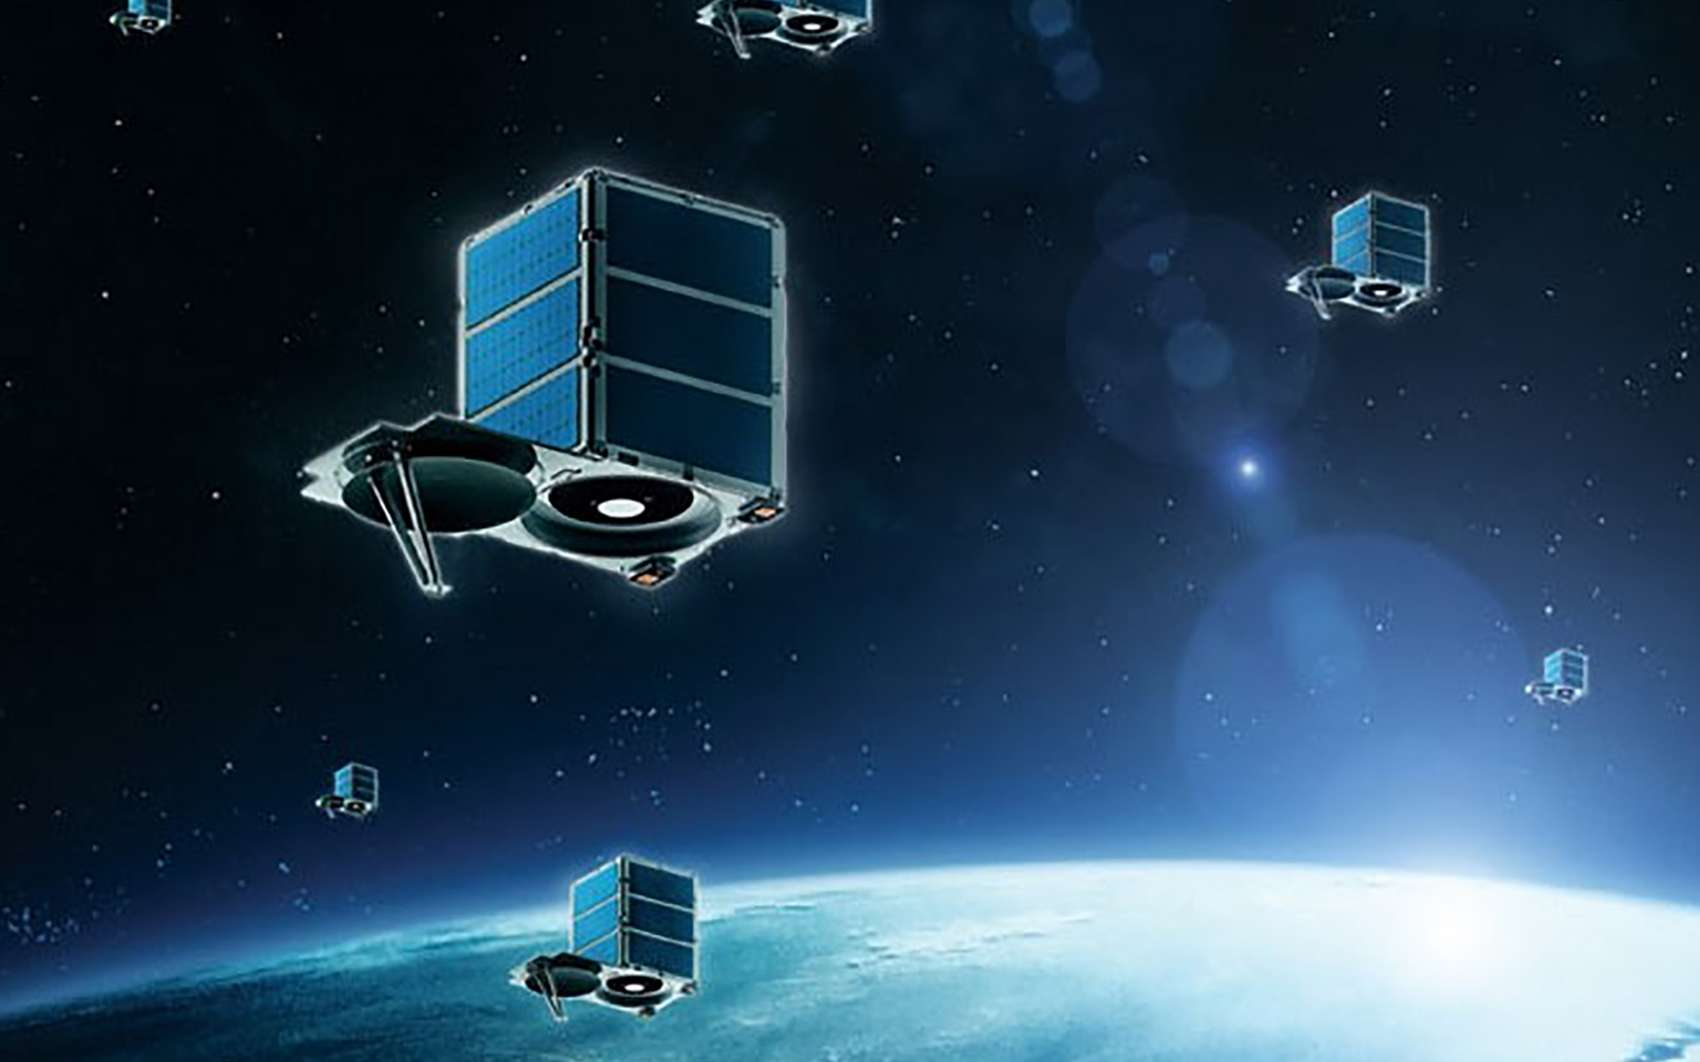 SkySat, une des familles de microsatellites qui composent la constellation Planet. © Terra Bella